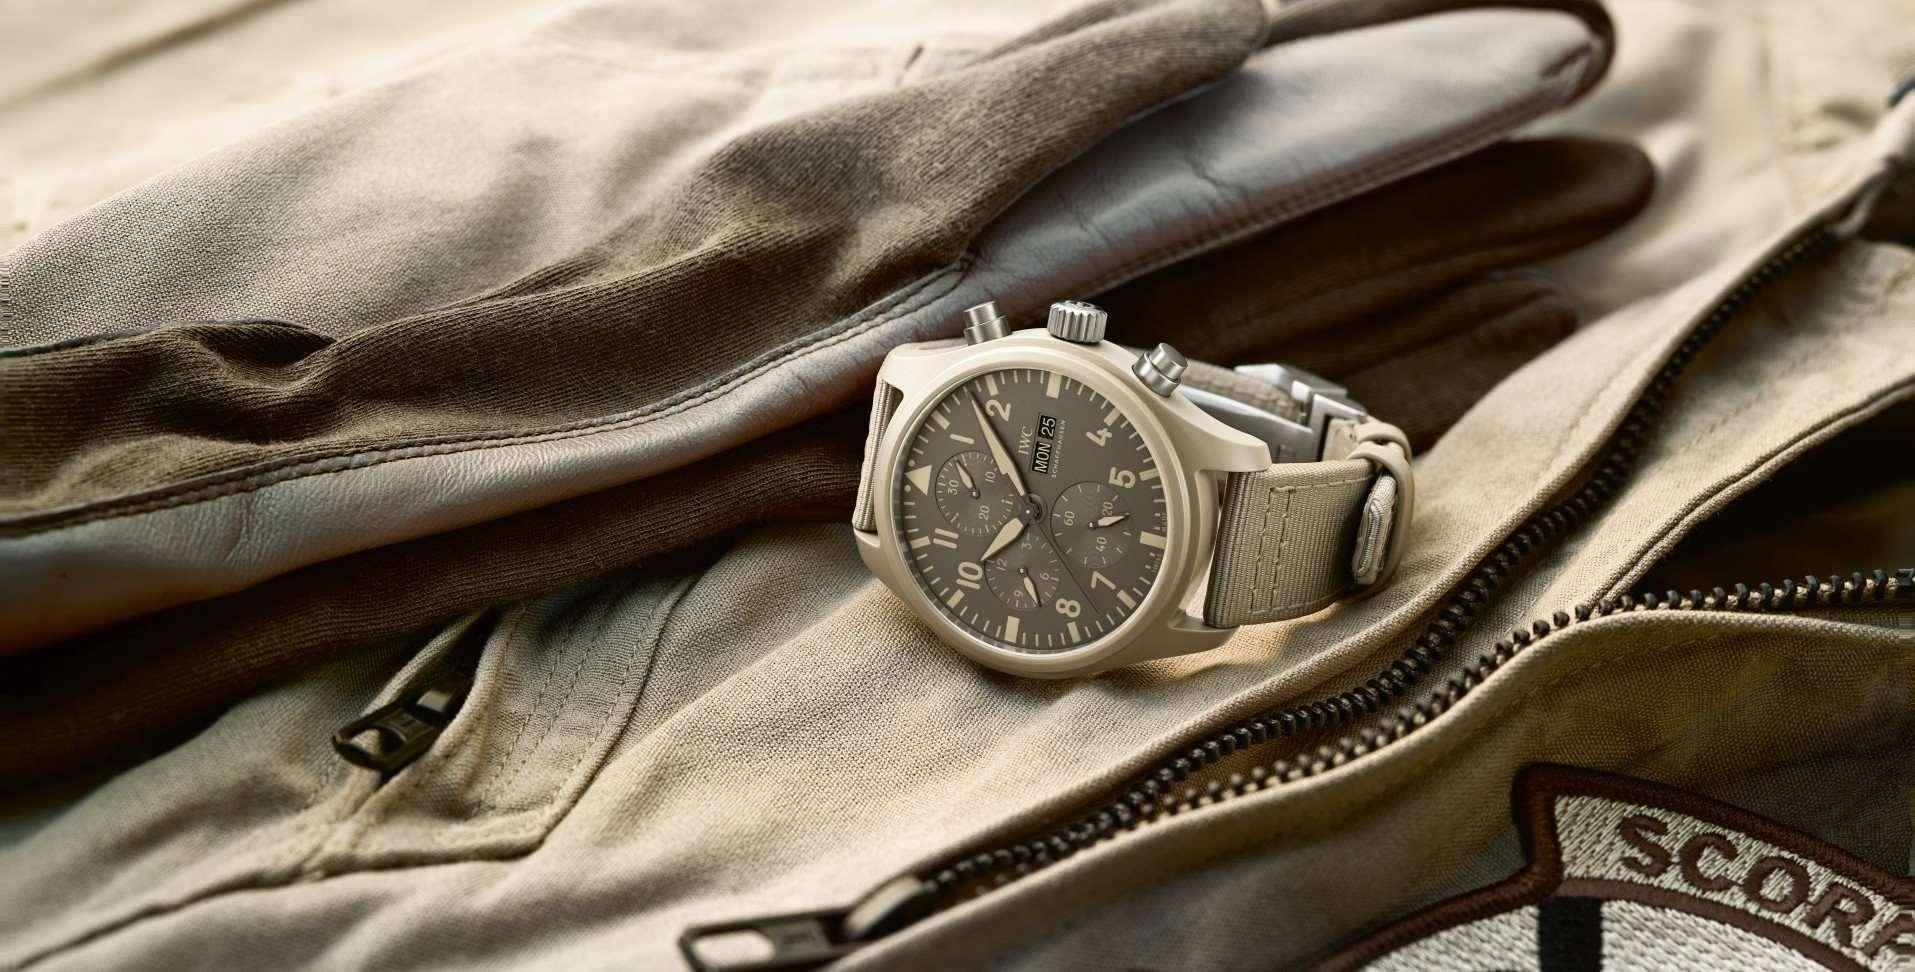 【SIHH 2019錶展報導】IWC以創新錶殼材料打造全新TOP GUN海軍空戰部隊系列腕錶(附價格)